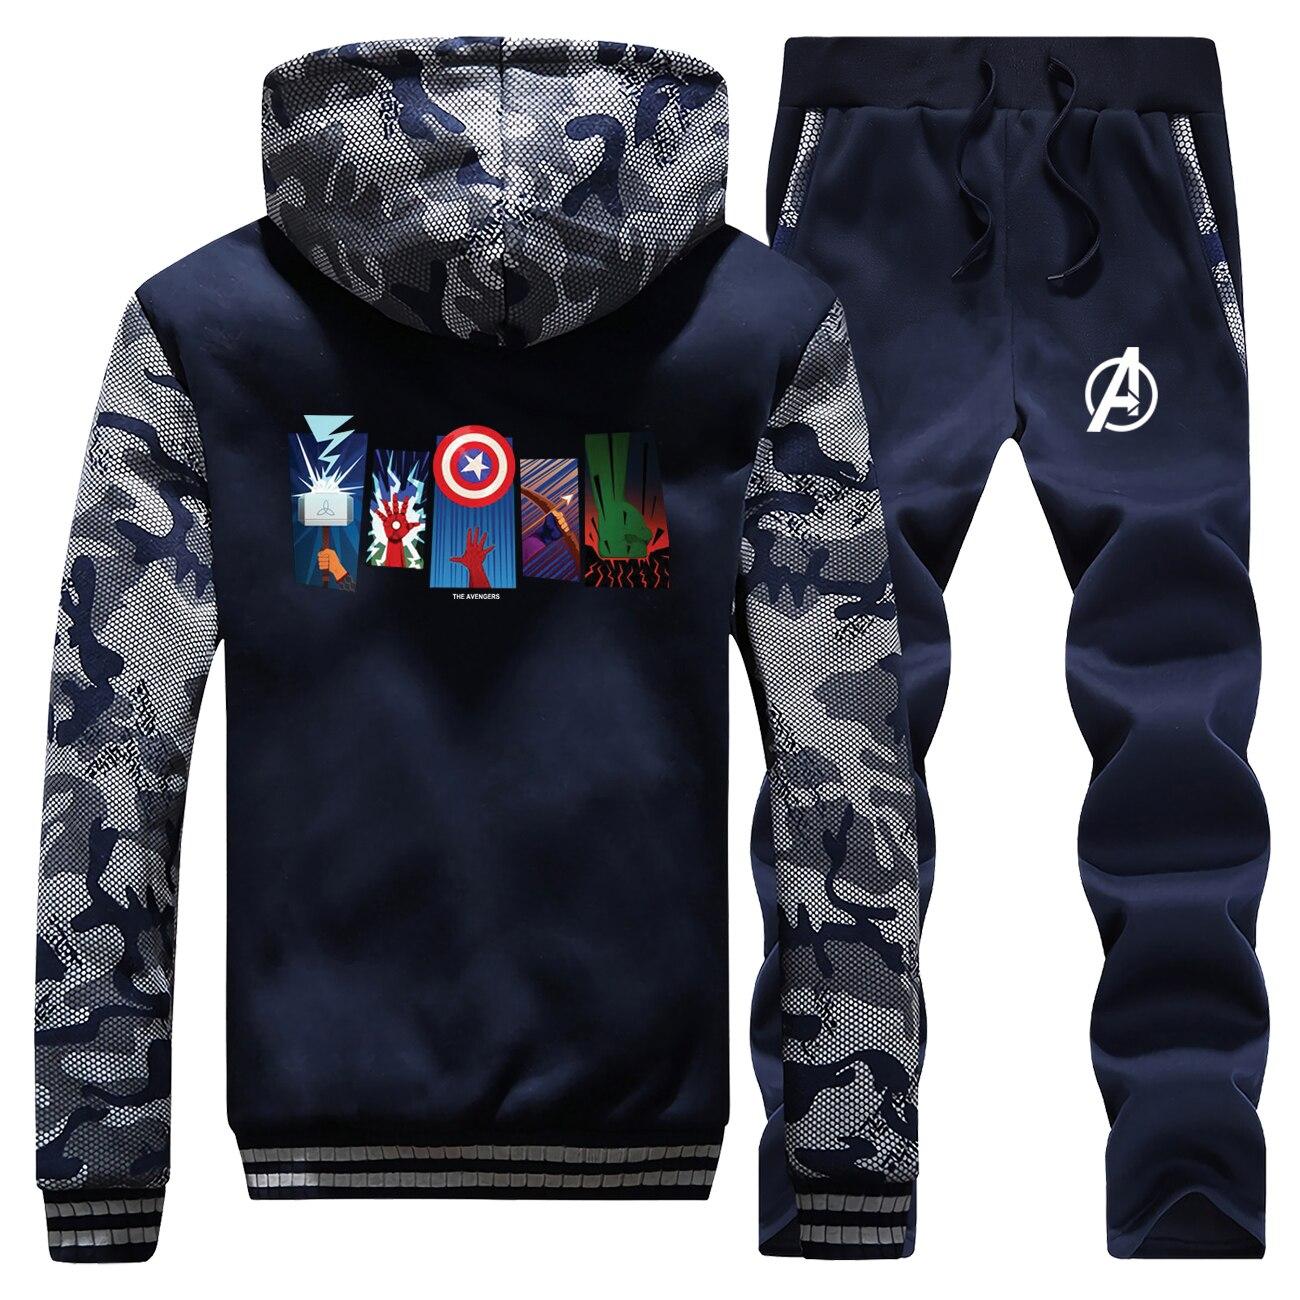 The Avengers Superhero Tracksuits Jacket Pant Set Men  Warm Captain America Hulk Iron Man Sportsuits Hoodie Sweatpant 2 PCS Coat